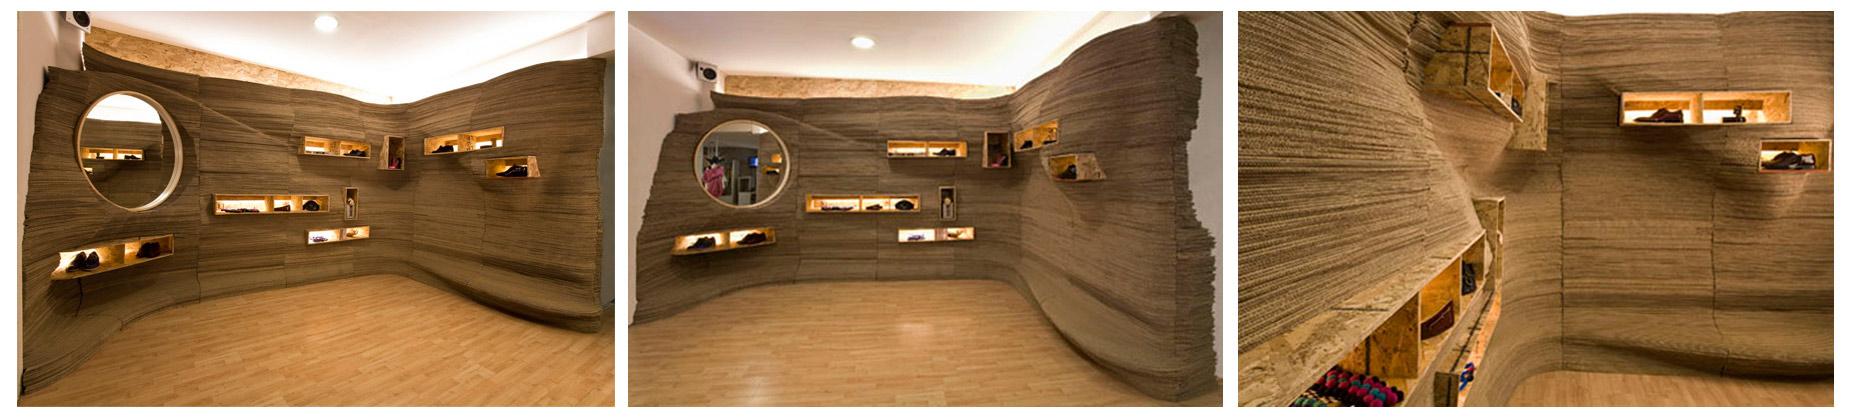 pop-up-store-tienda-cartón-cardboard-cartonlab-design-7